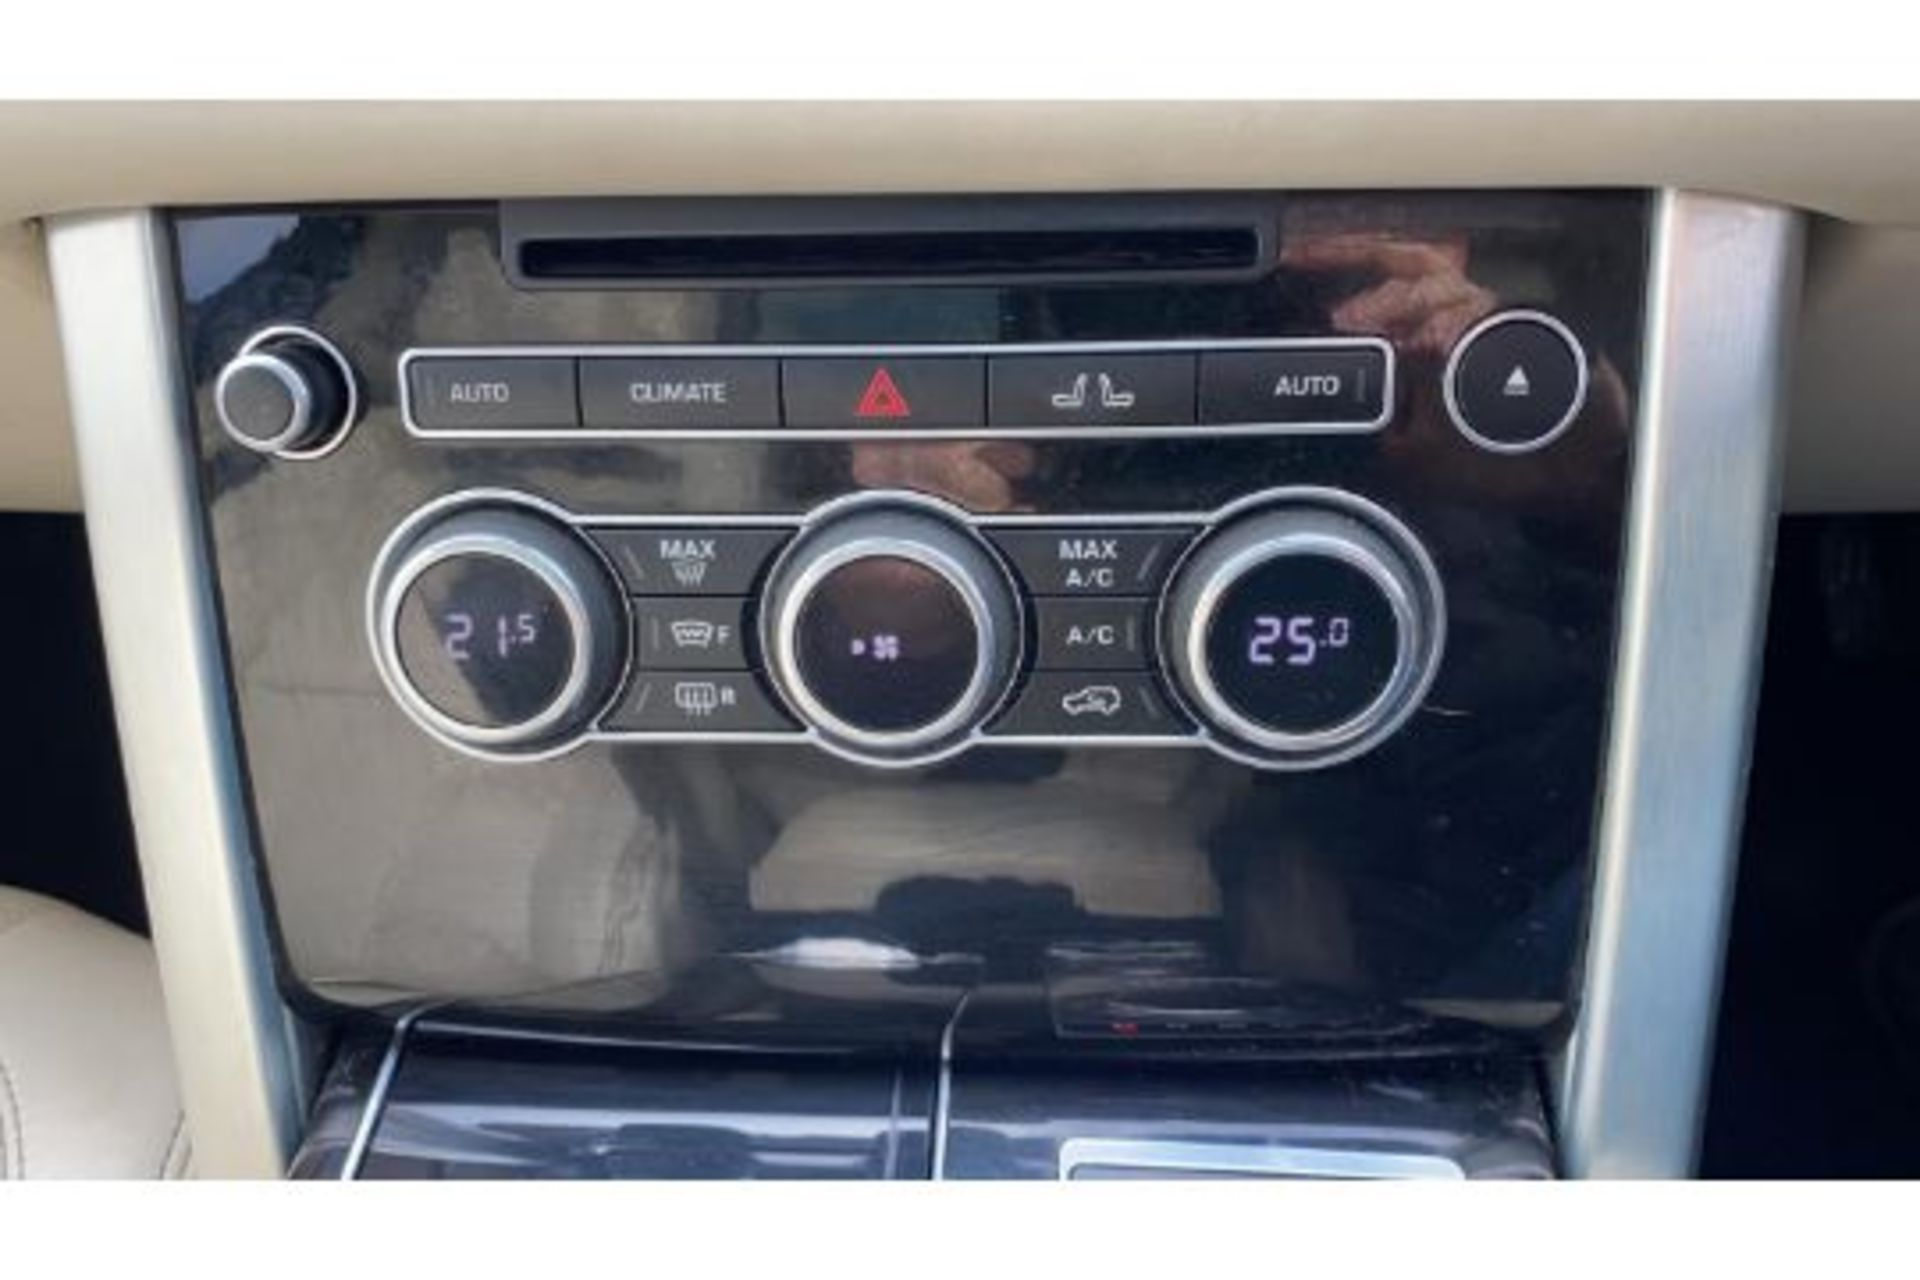 Range Rover Vogue 3.0 TDV6 SE Auto - Black Pack - NEW SHAPE - FULLY LOADED - Pan Roof - Image 26 of 30